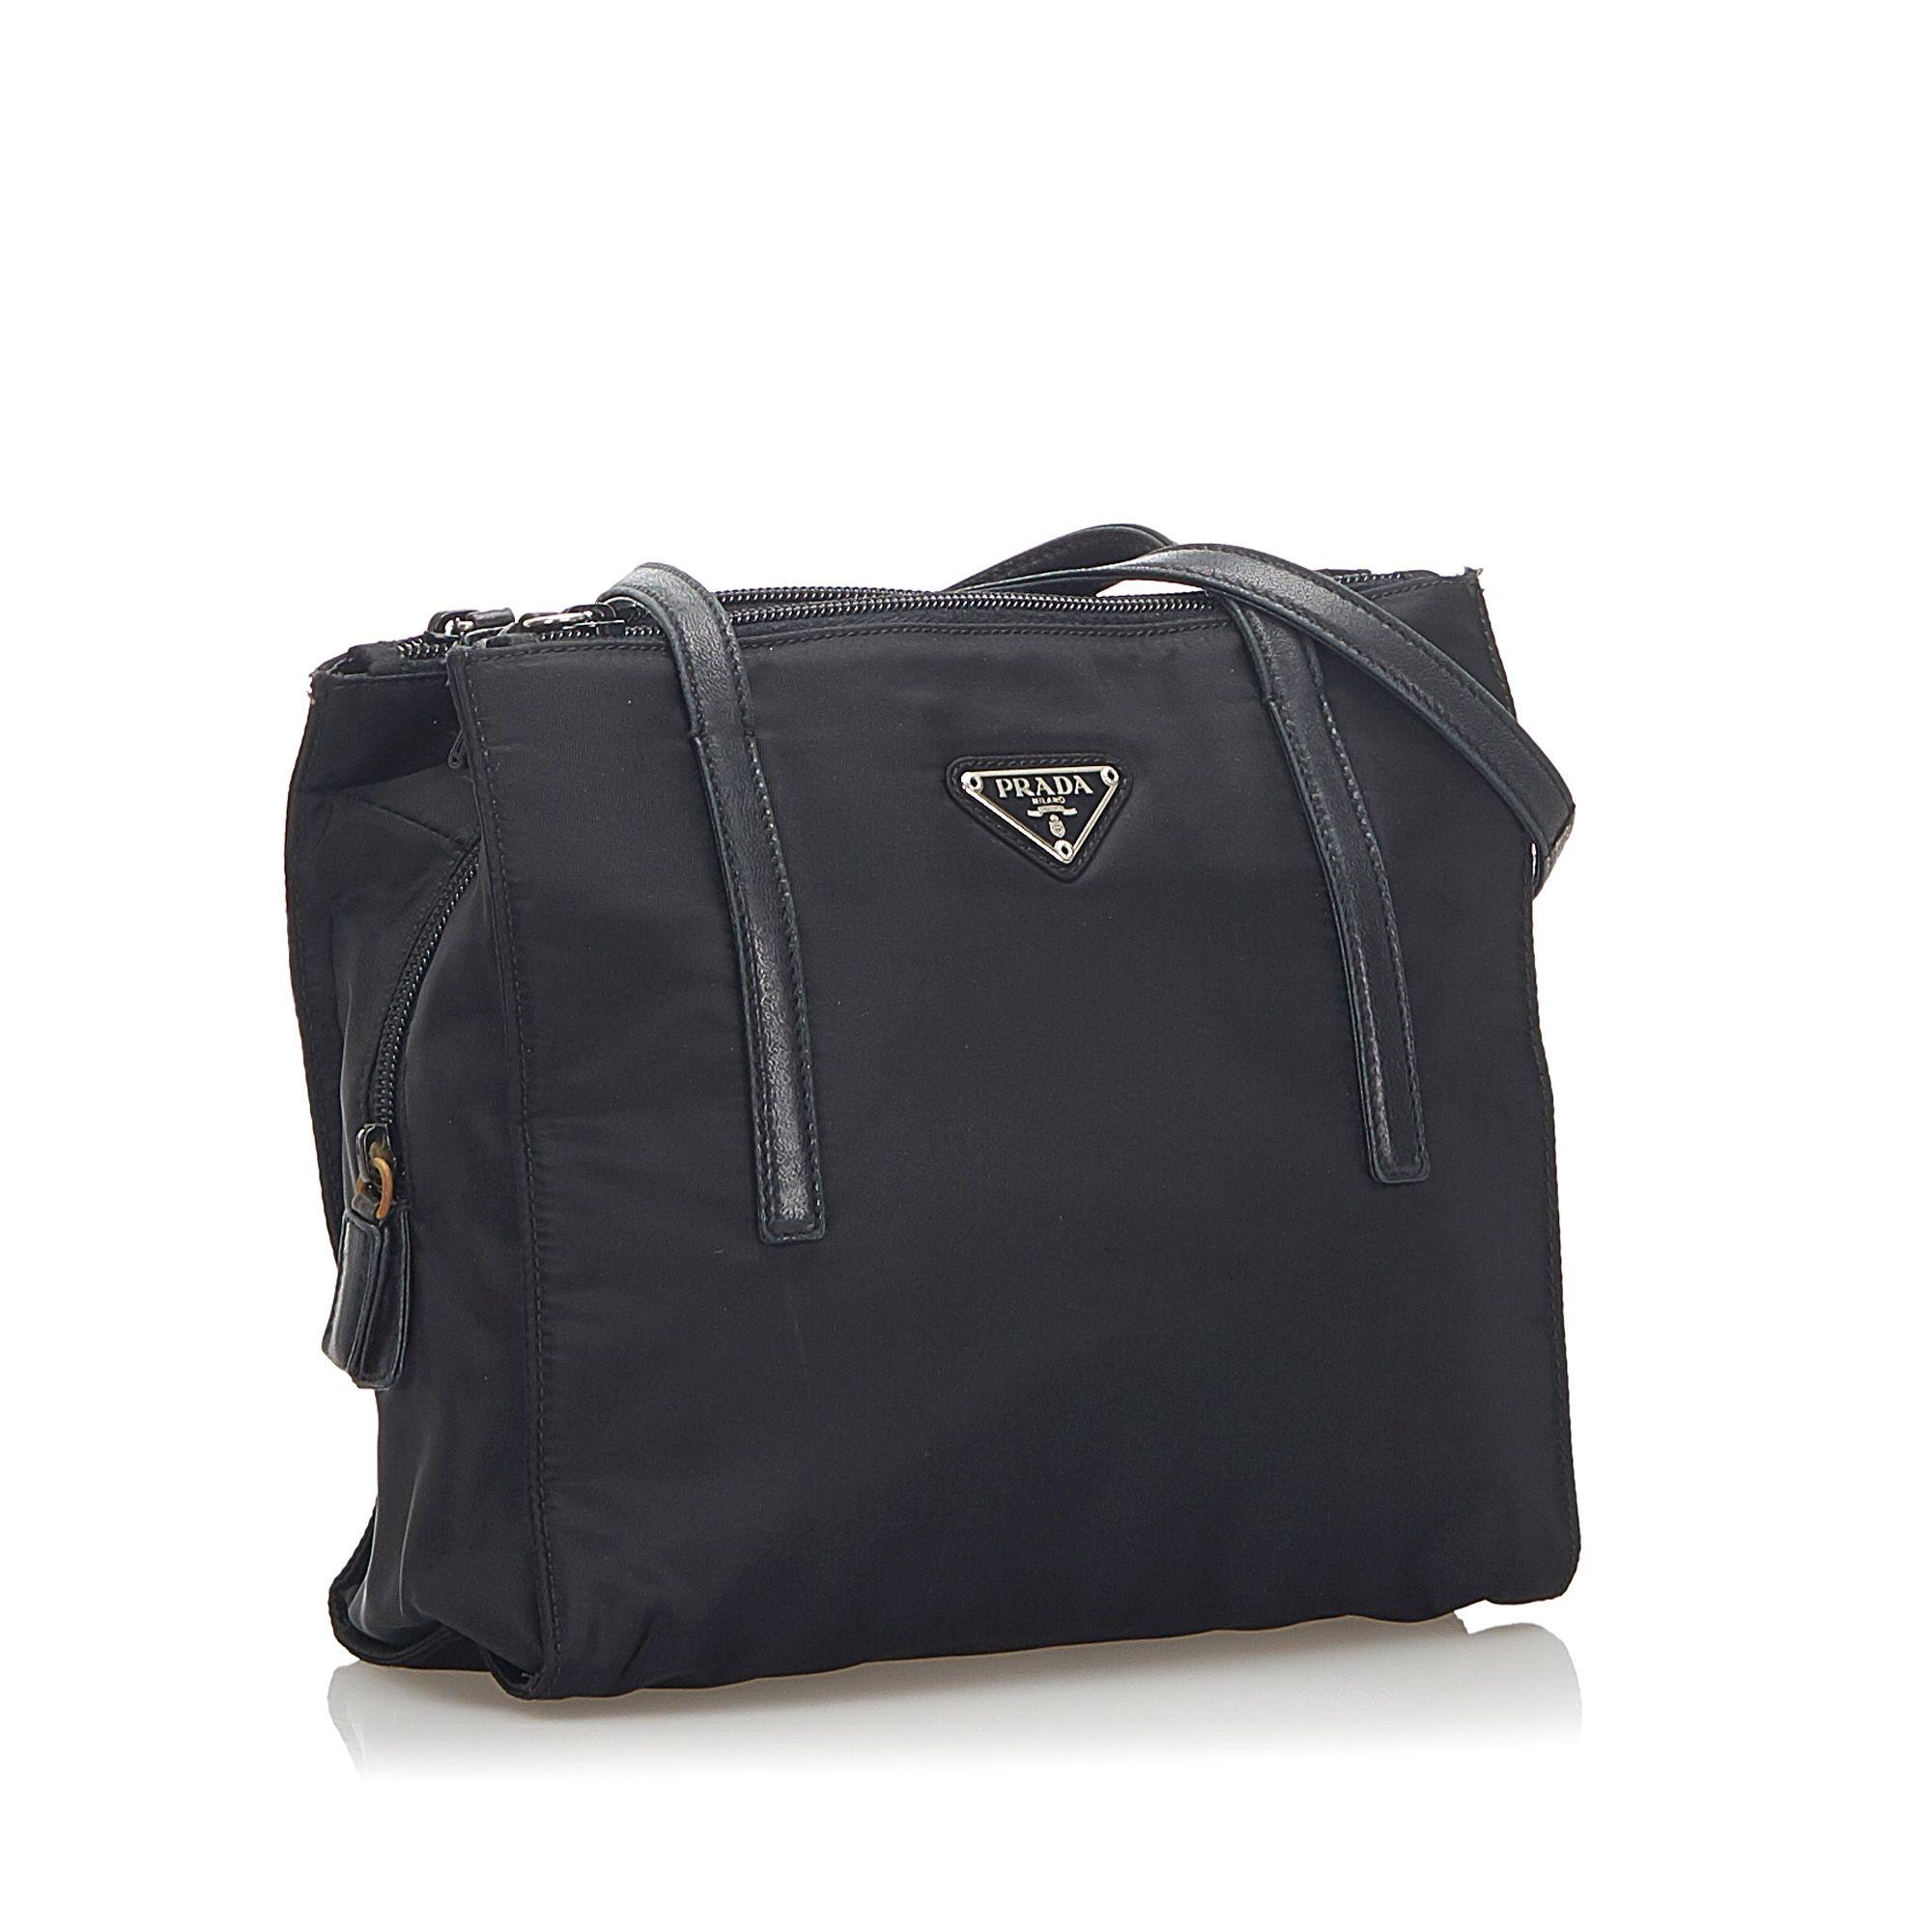 Vintage Prada Tessuto Shoulder Bag Black